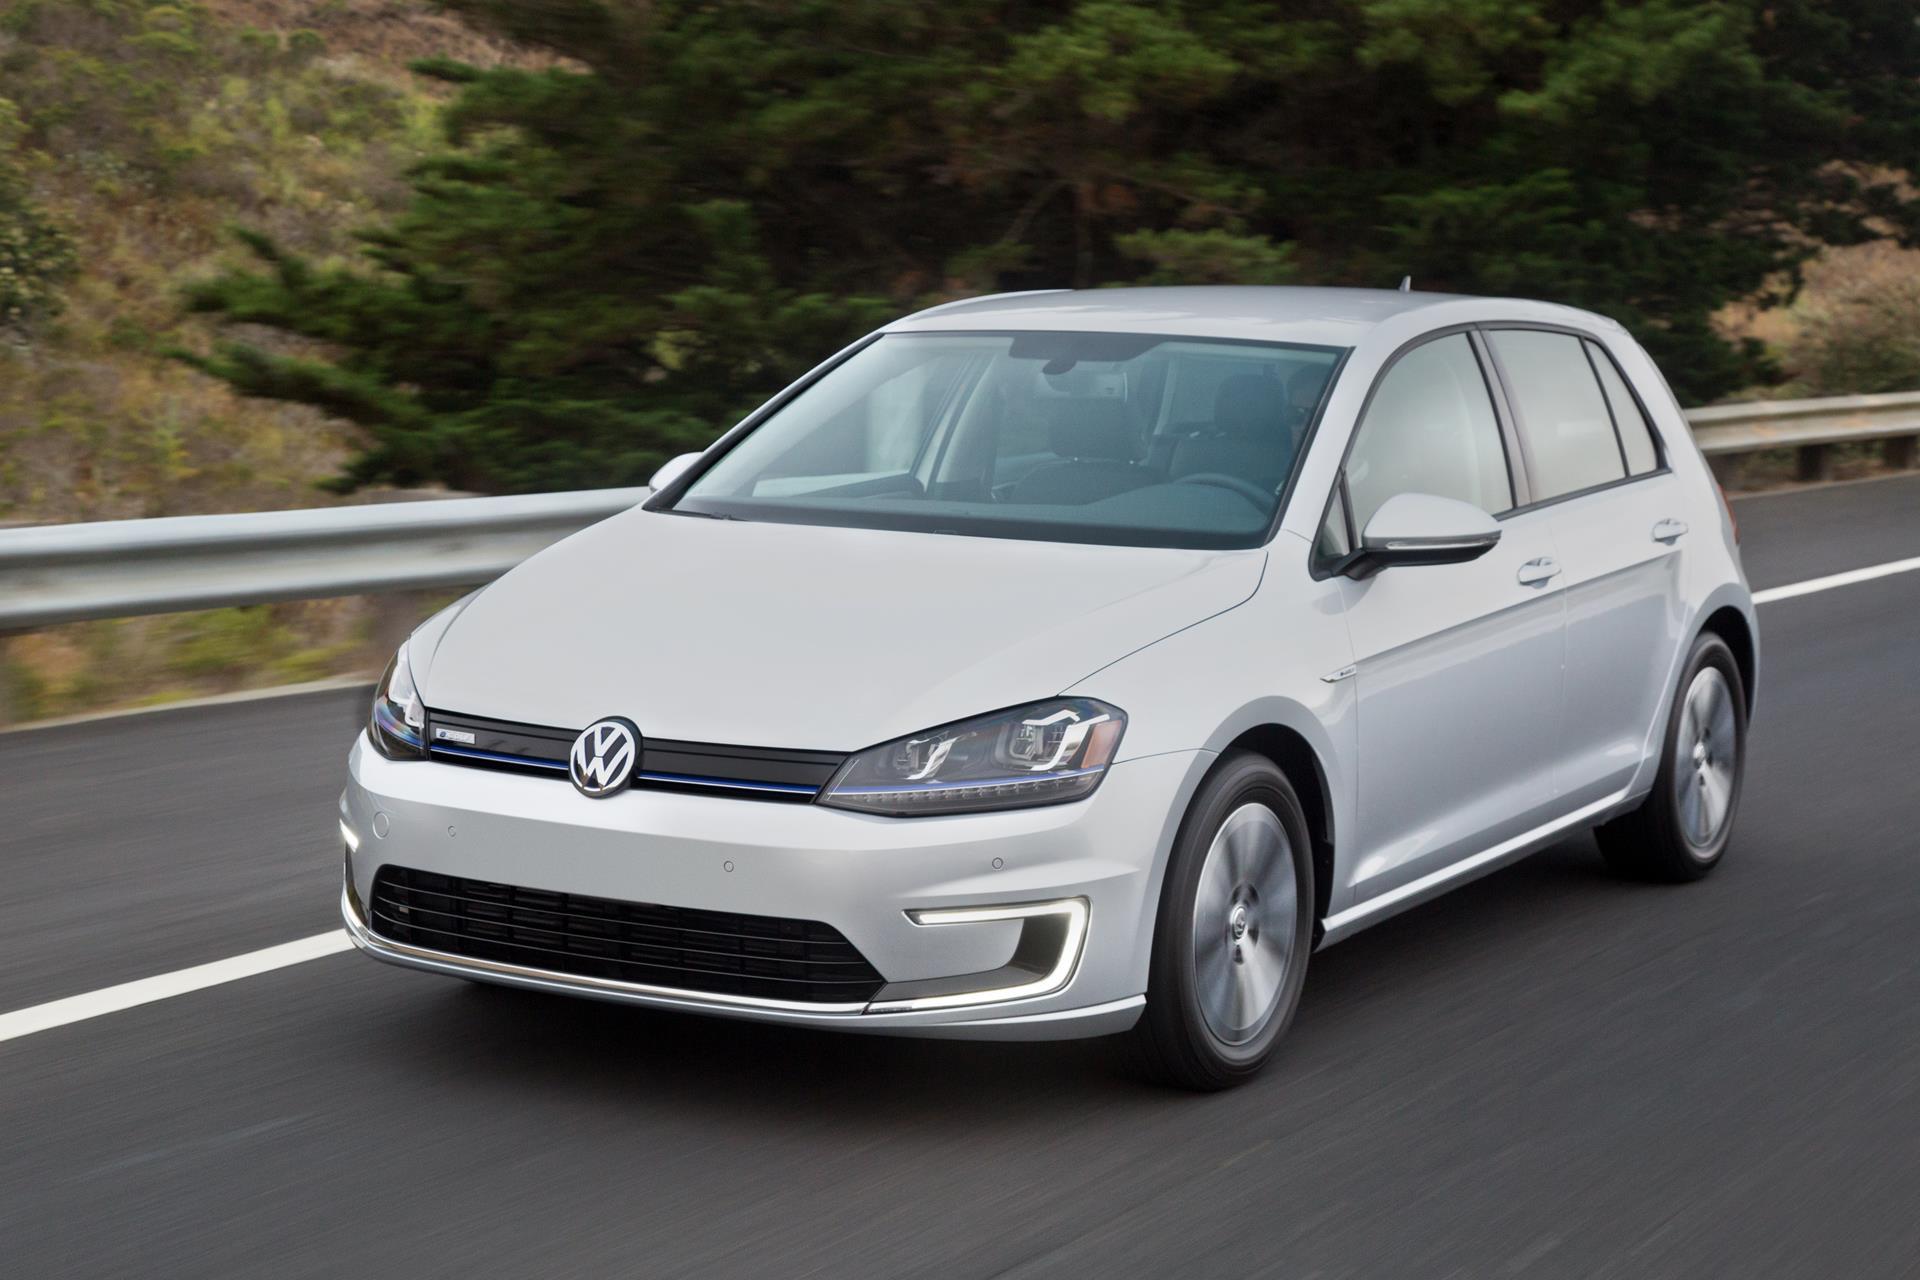 2016 Volkswagen E Golf >> 2016 Volkswagen E Golf News And Information